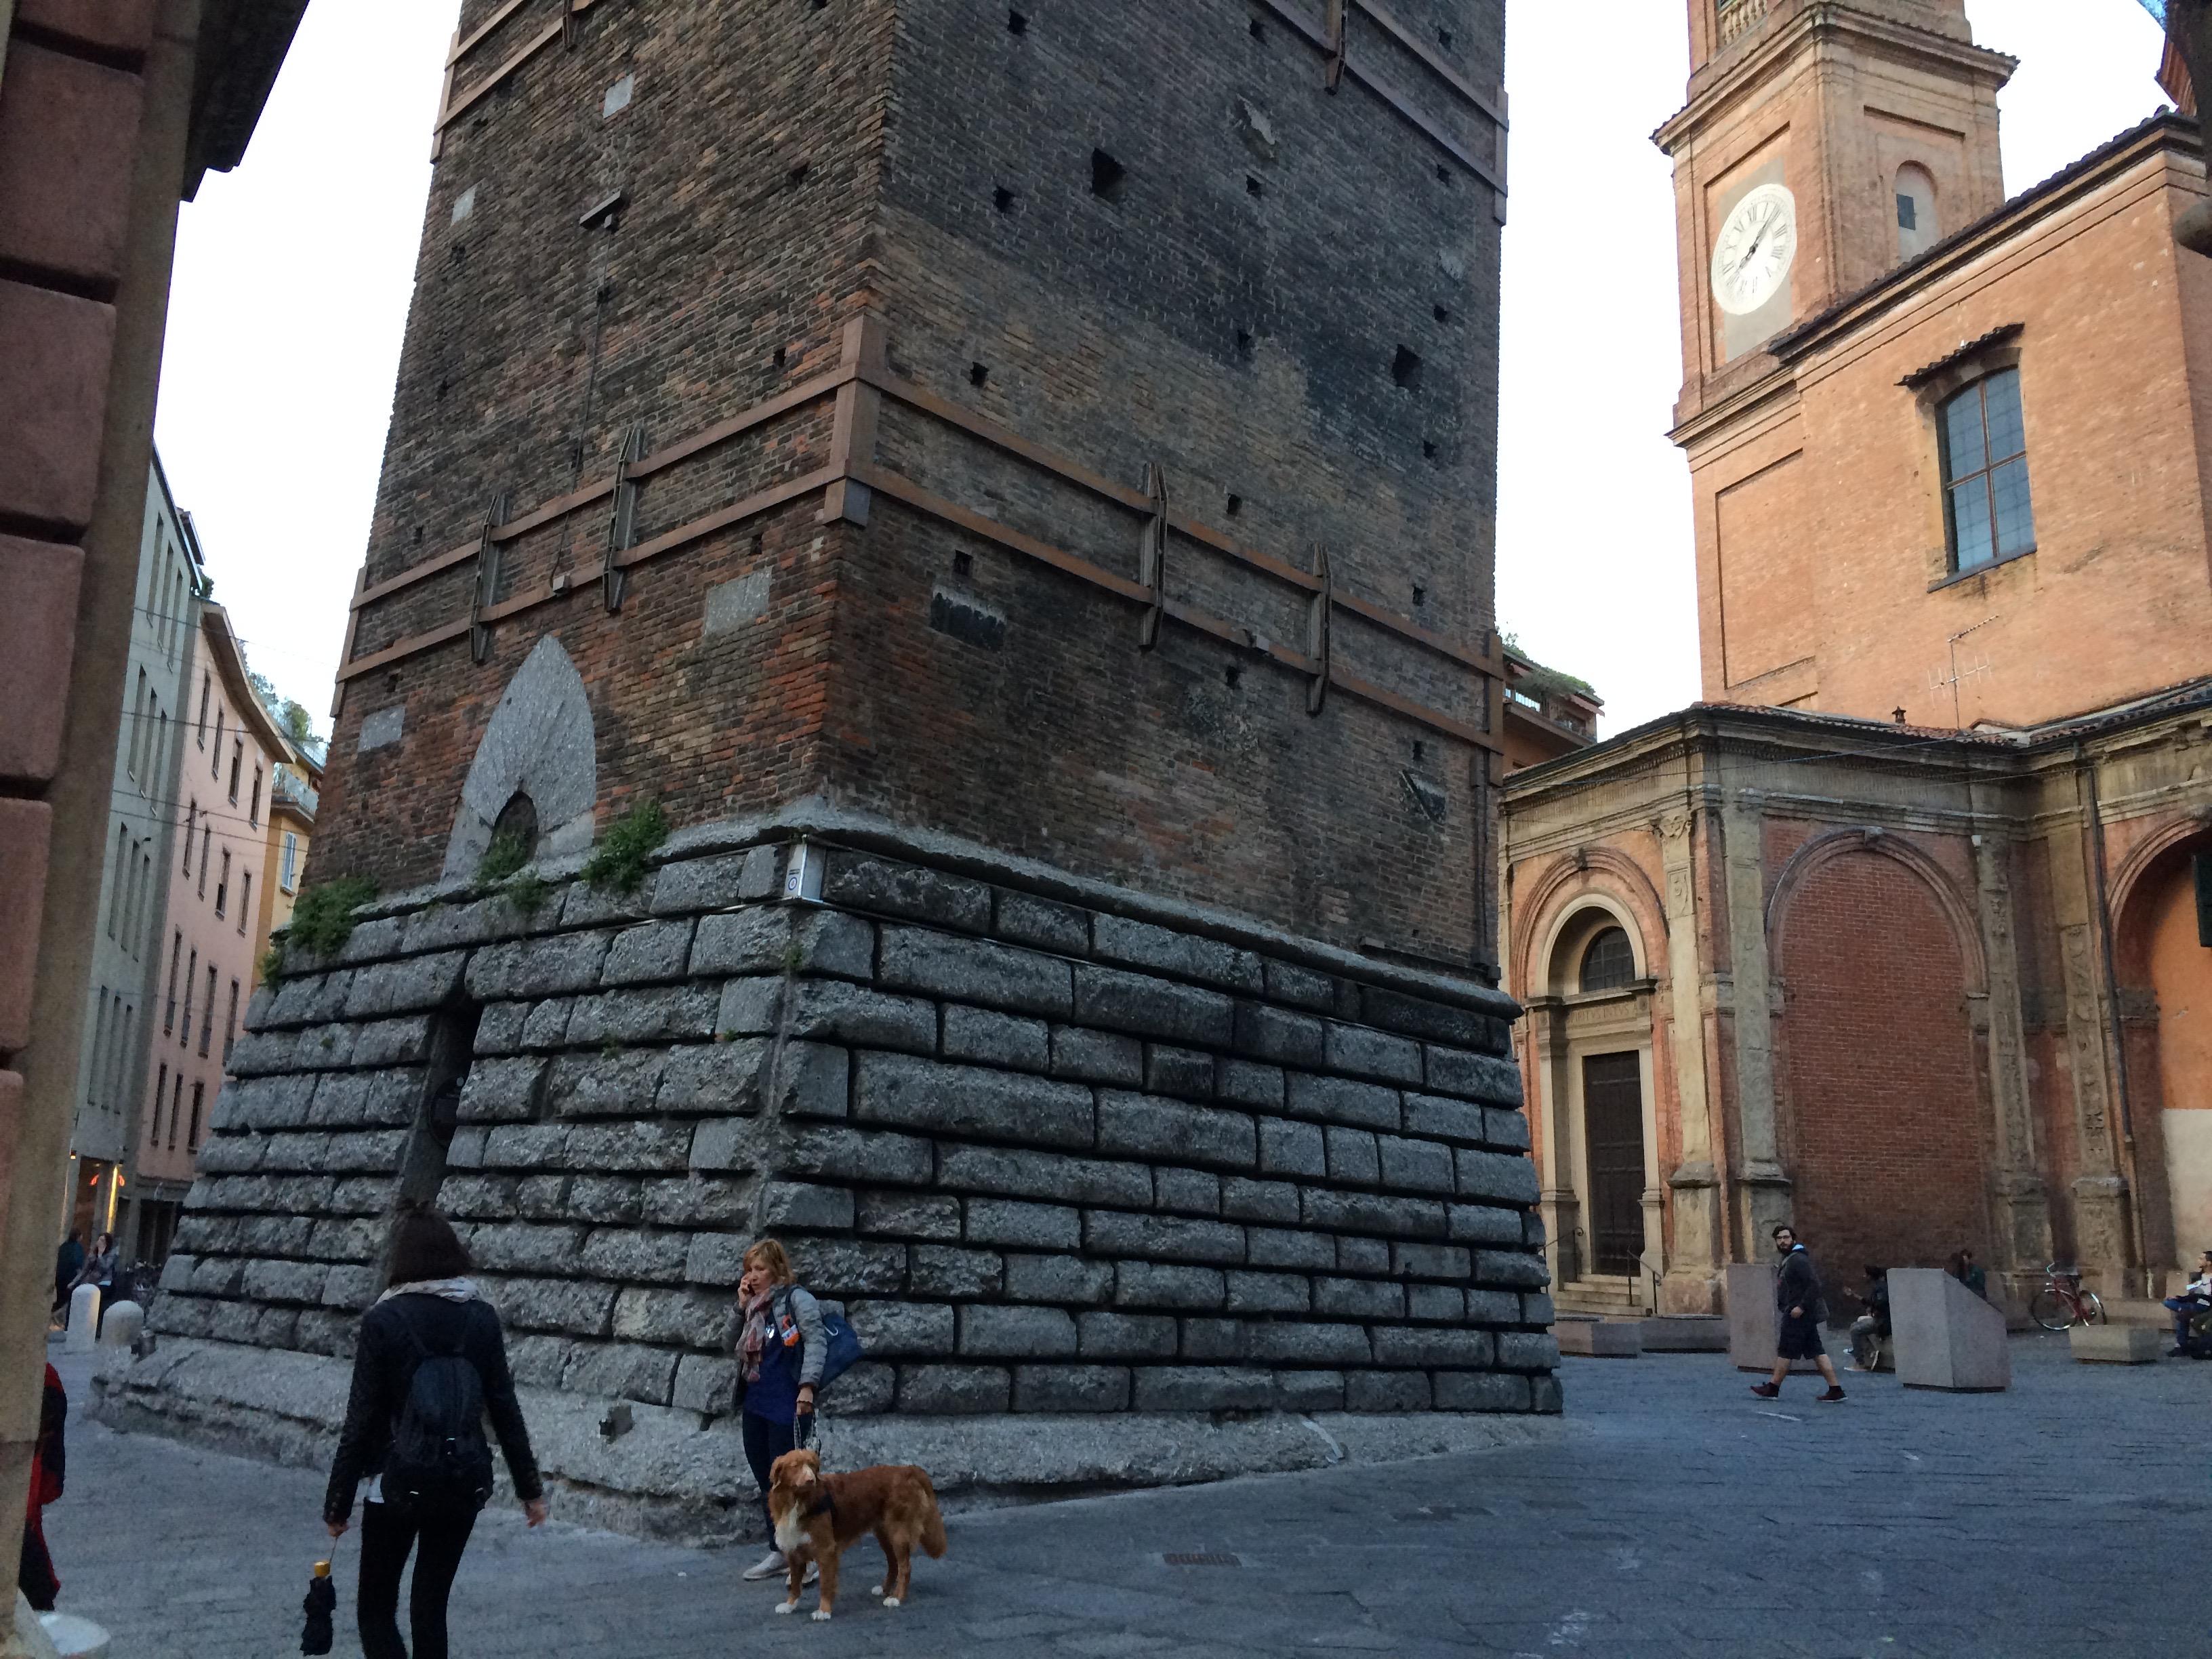 Bologna -  base of Garisenda tower